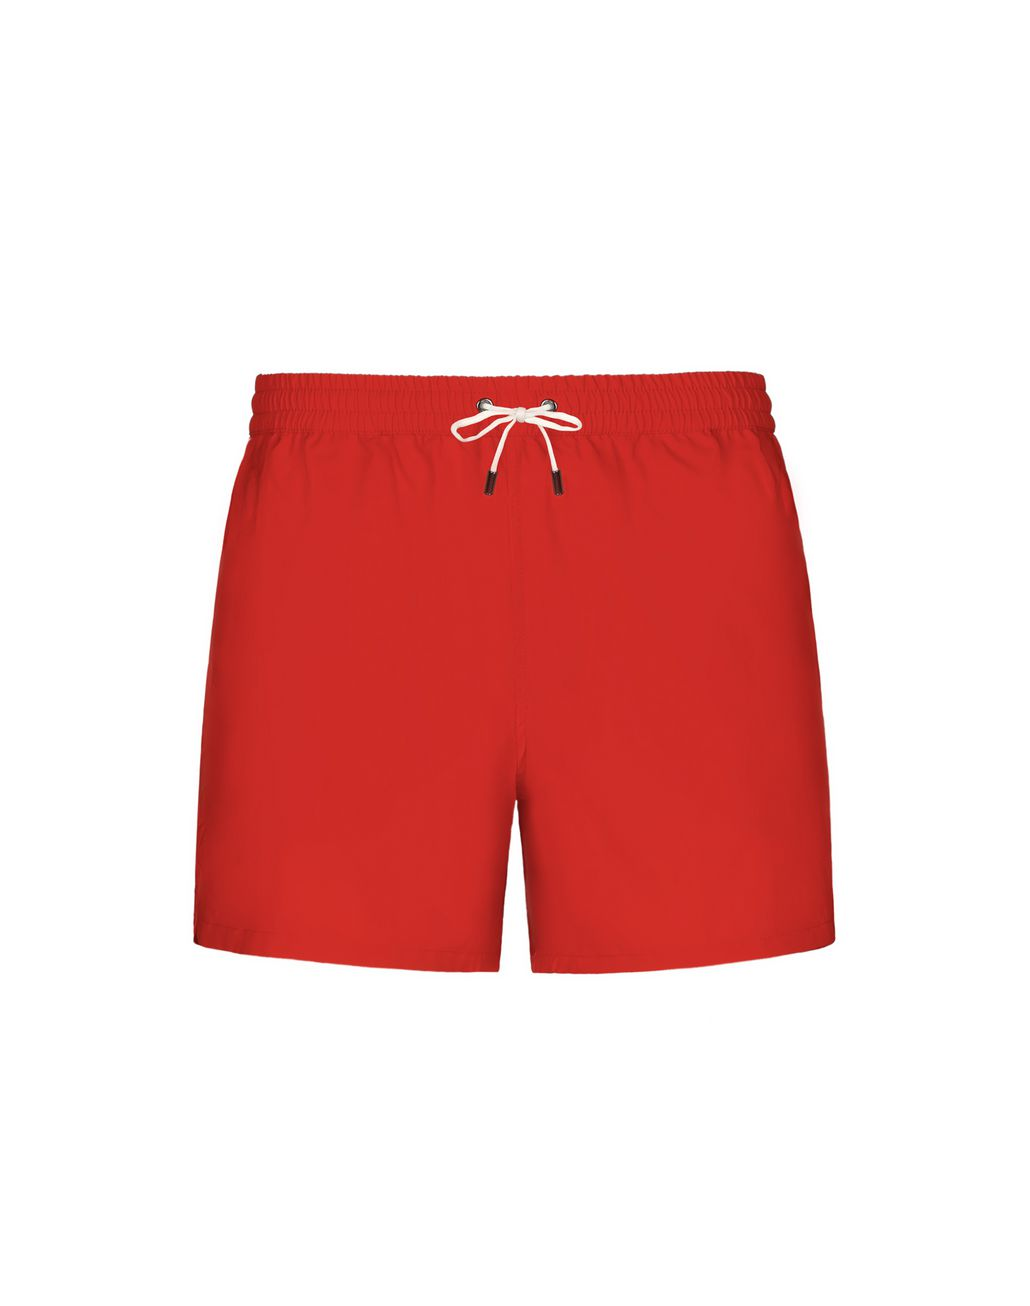 BRIONI Короткие красные шорты для плавания Пляжная мода Для Мужчин f